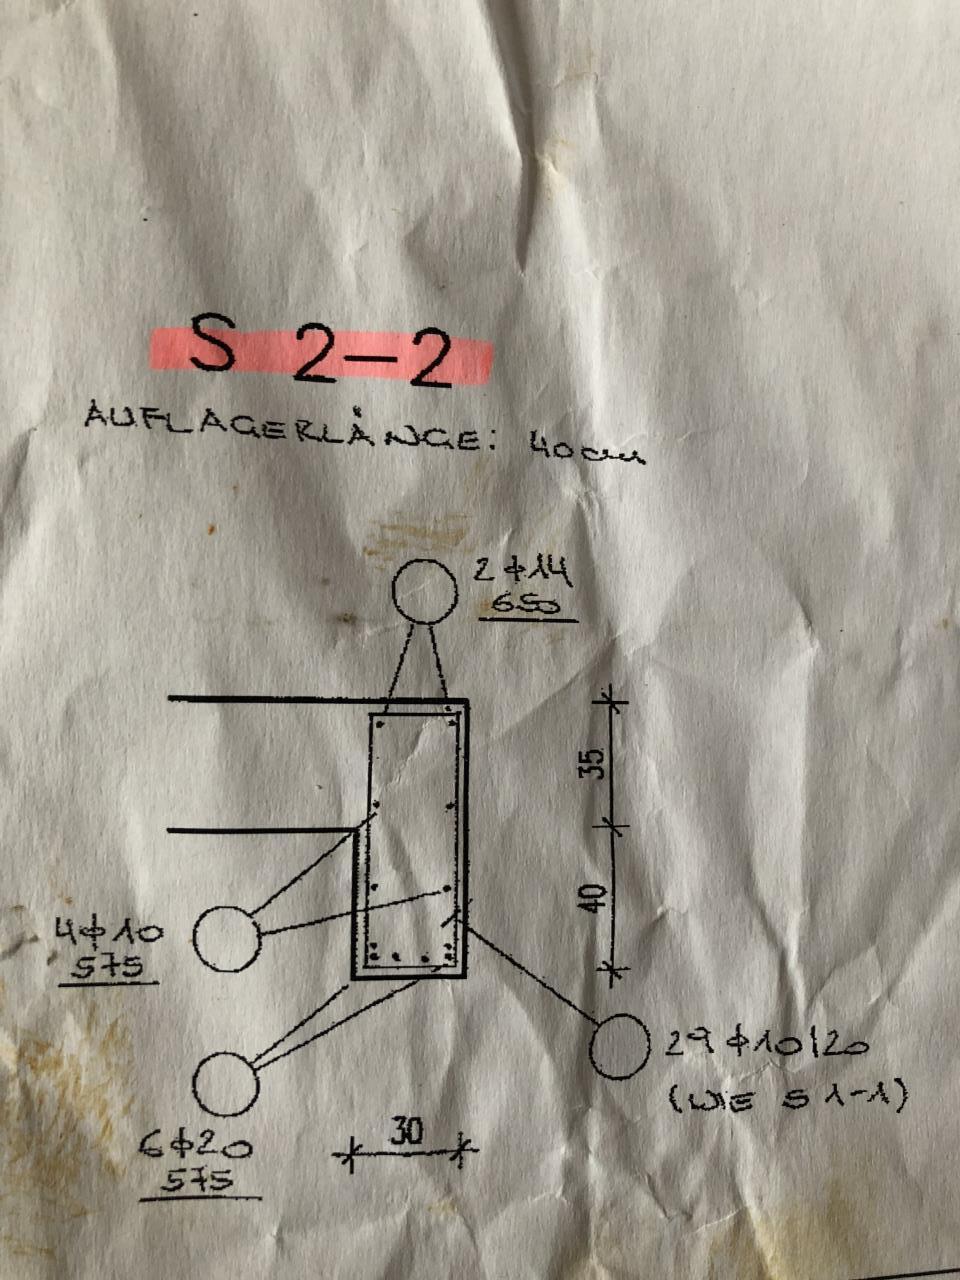 bew hrung statik f r 5m berlager bauforum auf. Black Bedroom Furniture Sets. Home Design Ideas